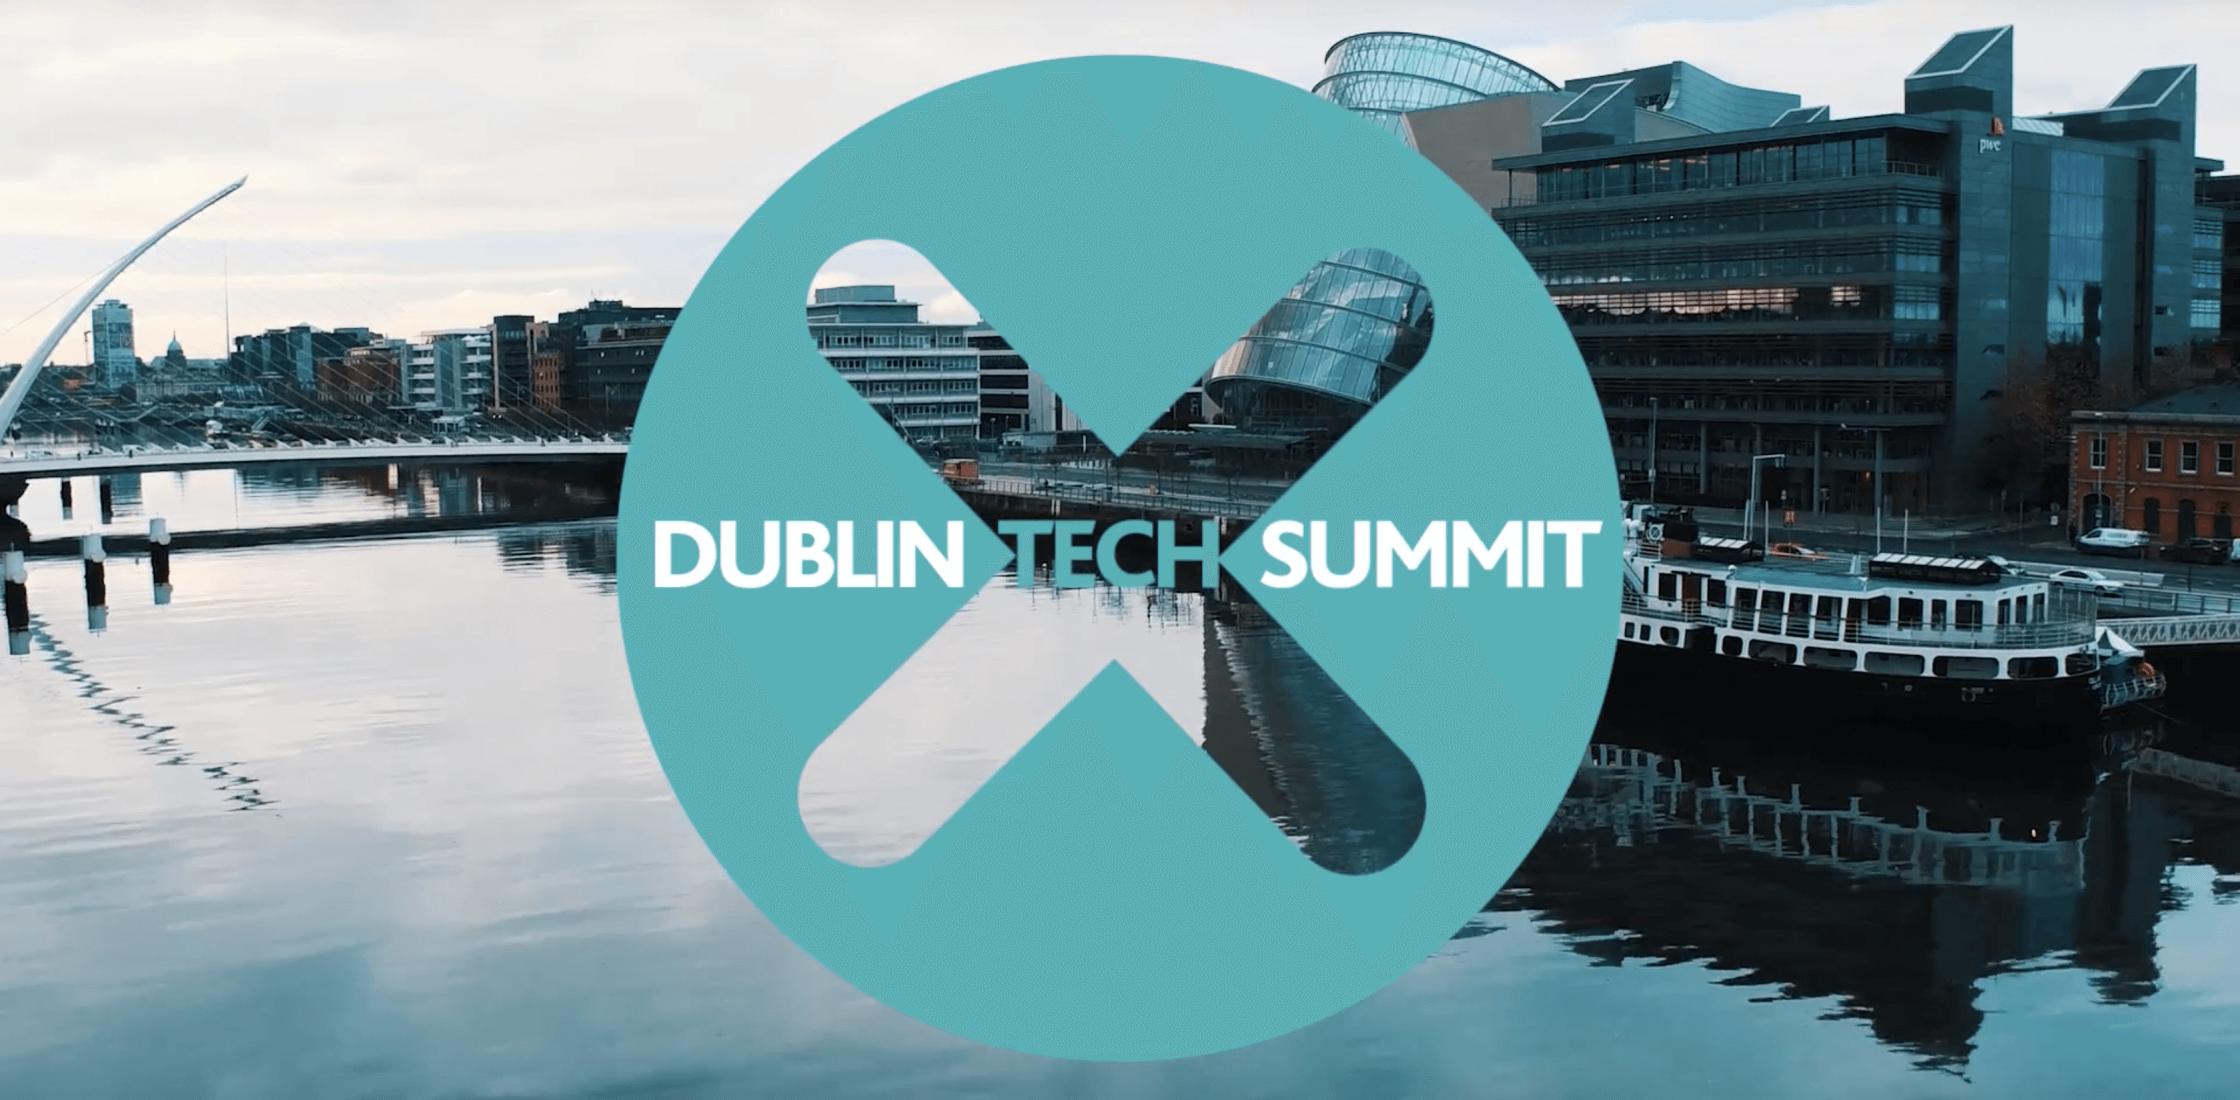 Dublin Tech Summit banner